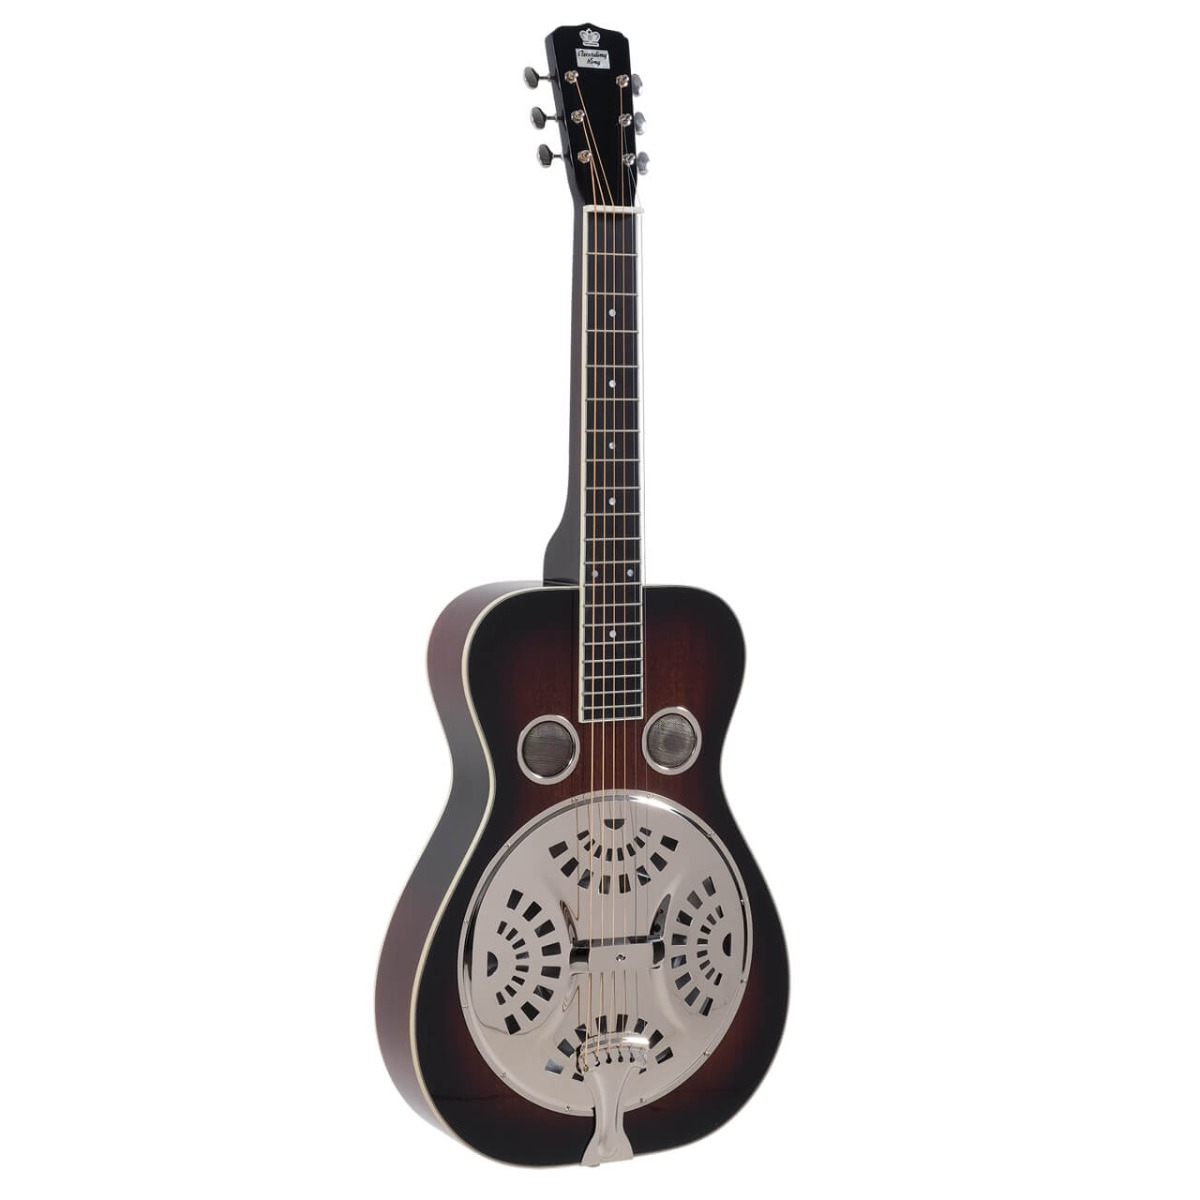 Recording King RR-60 VS squareneck resonator-guitar Vintage Sunburst